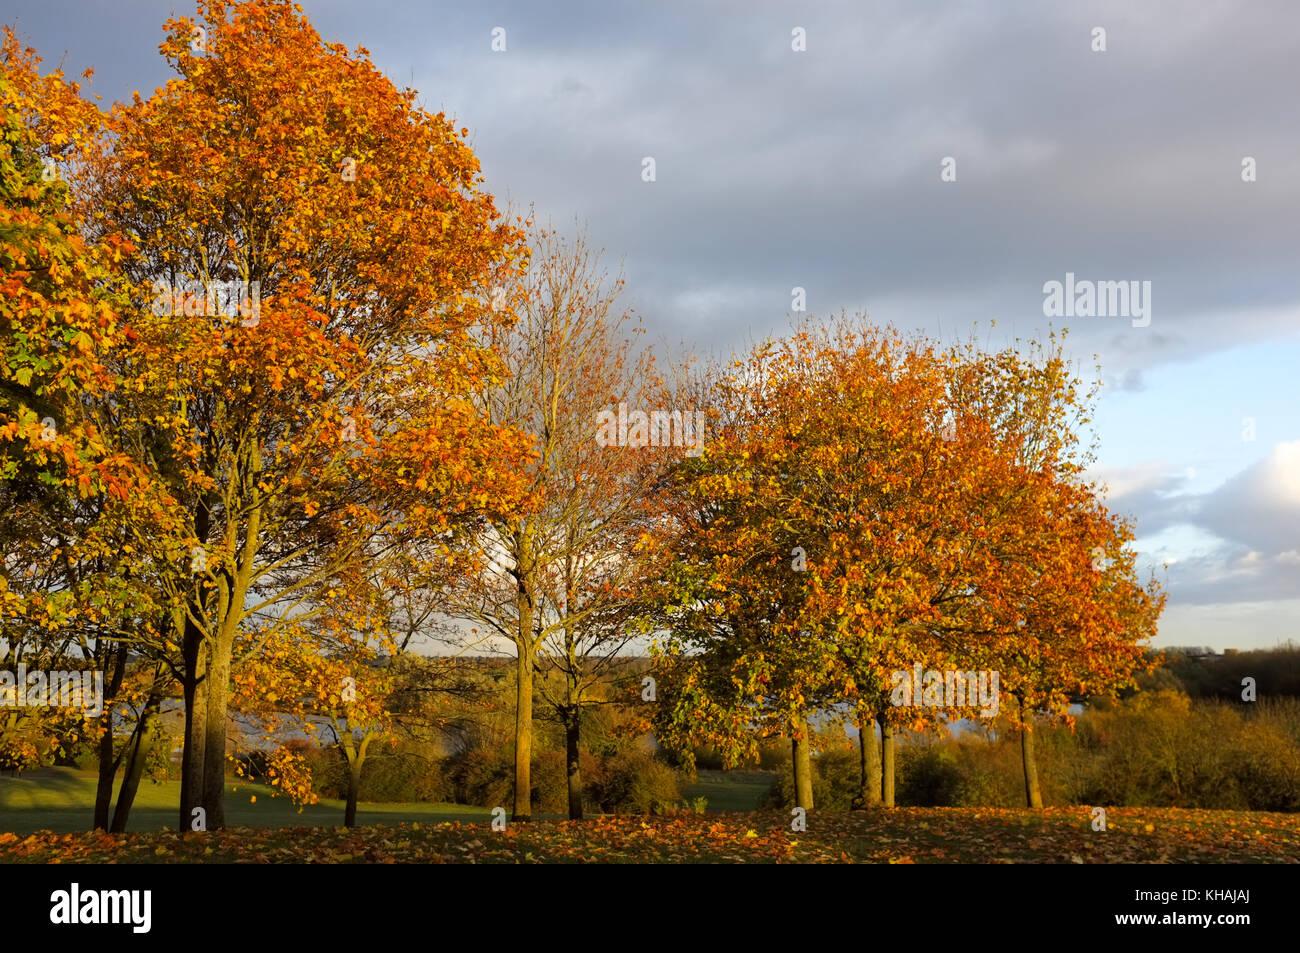 Autumn colours on trees in Willen Park, Milton Keynes, Buckinghamshire, England - Stock Image